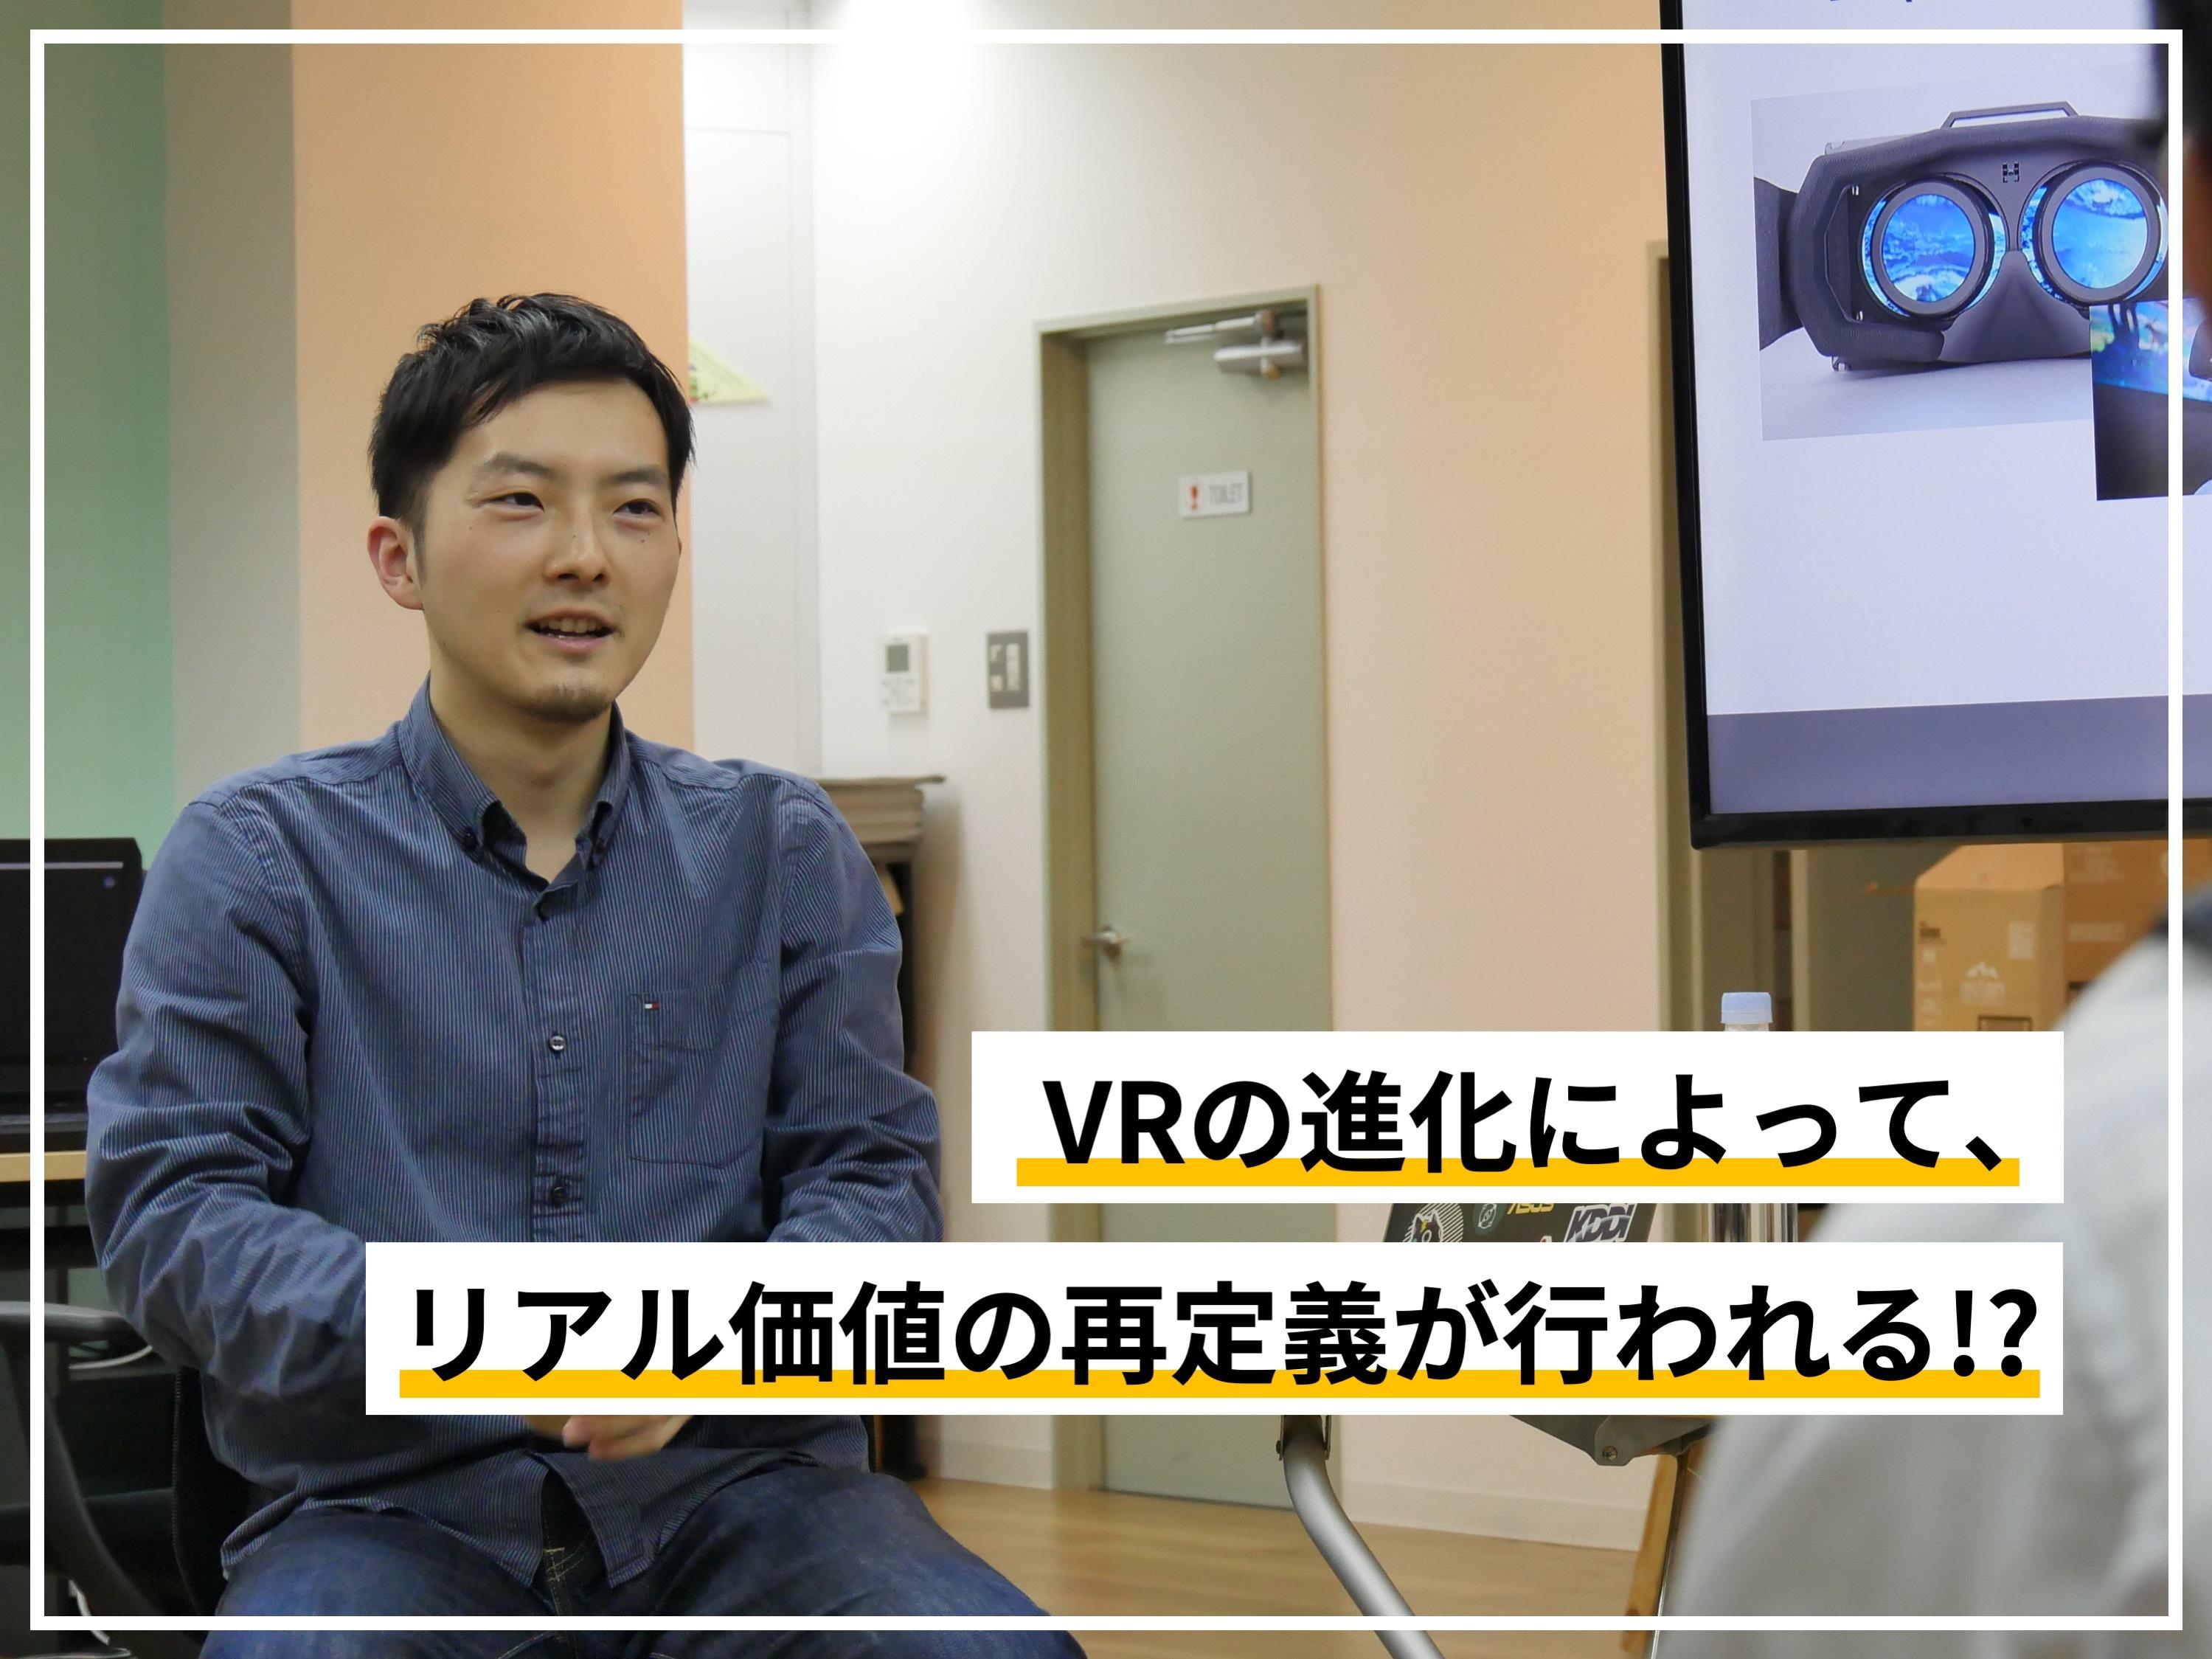 VRの進化によって、リアル価値の再定義が行われる!?<株式会社Synamon 武井勇樹 氏>